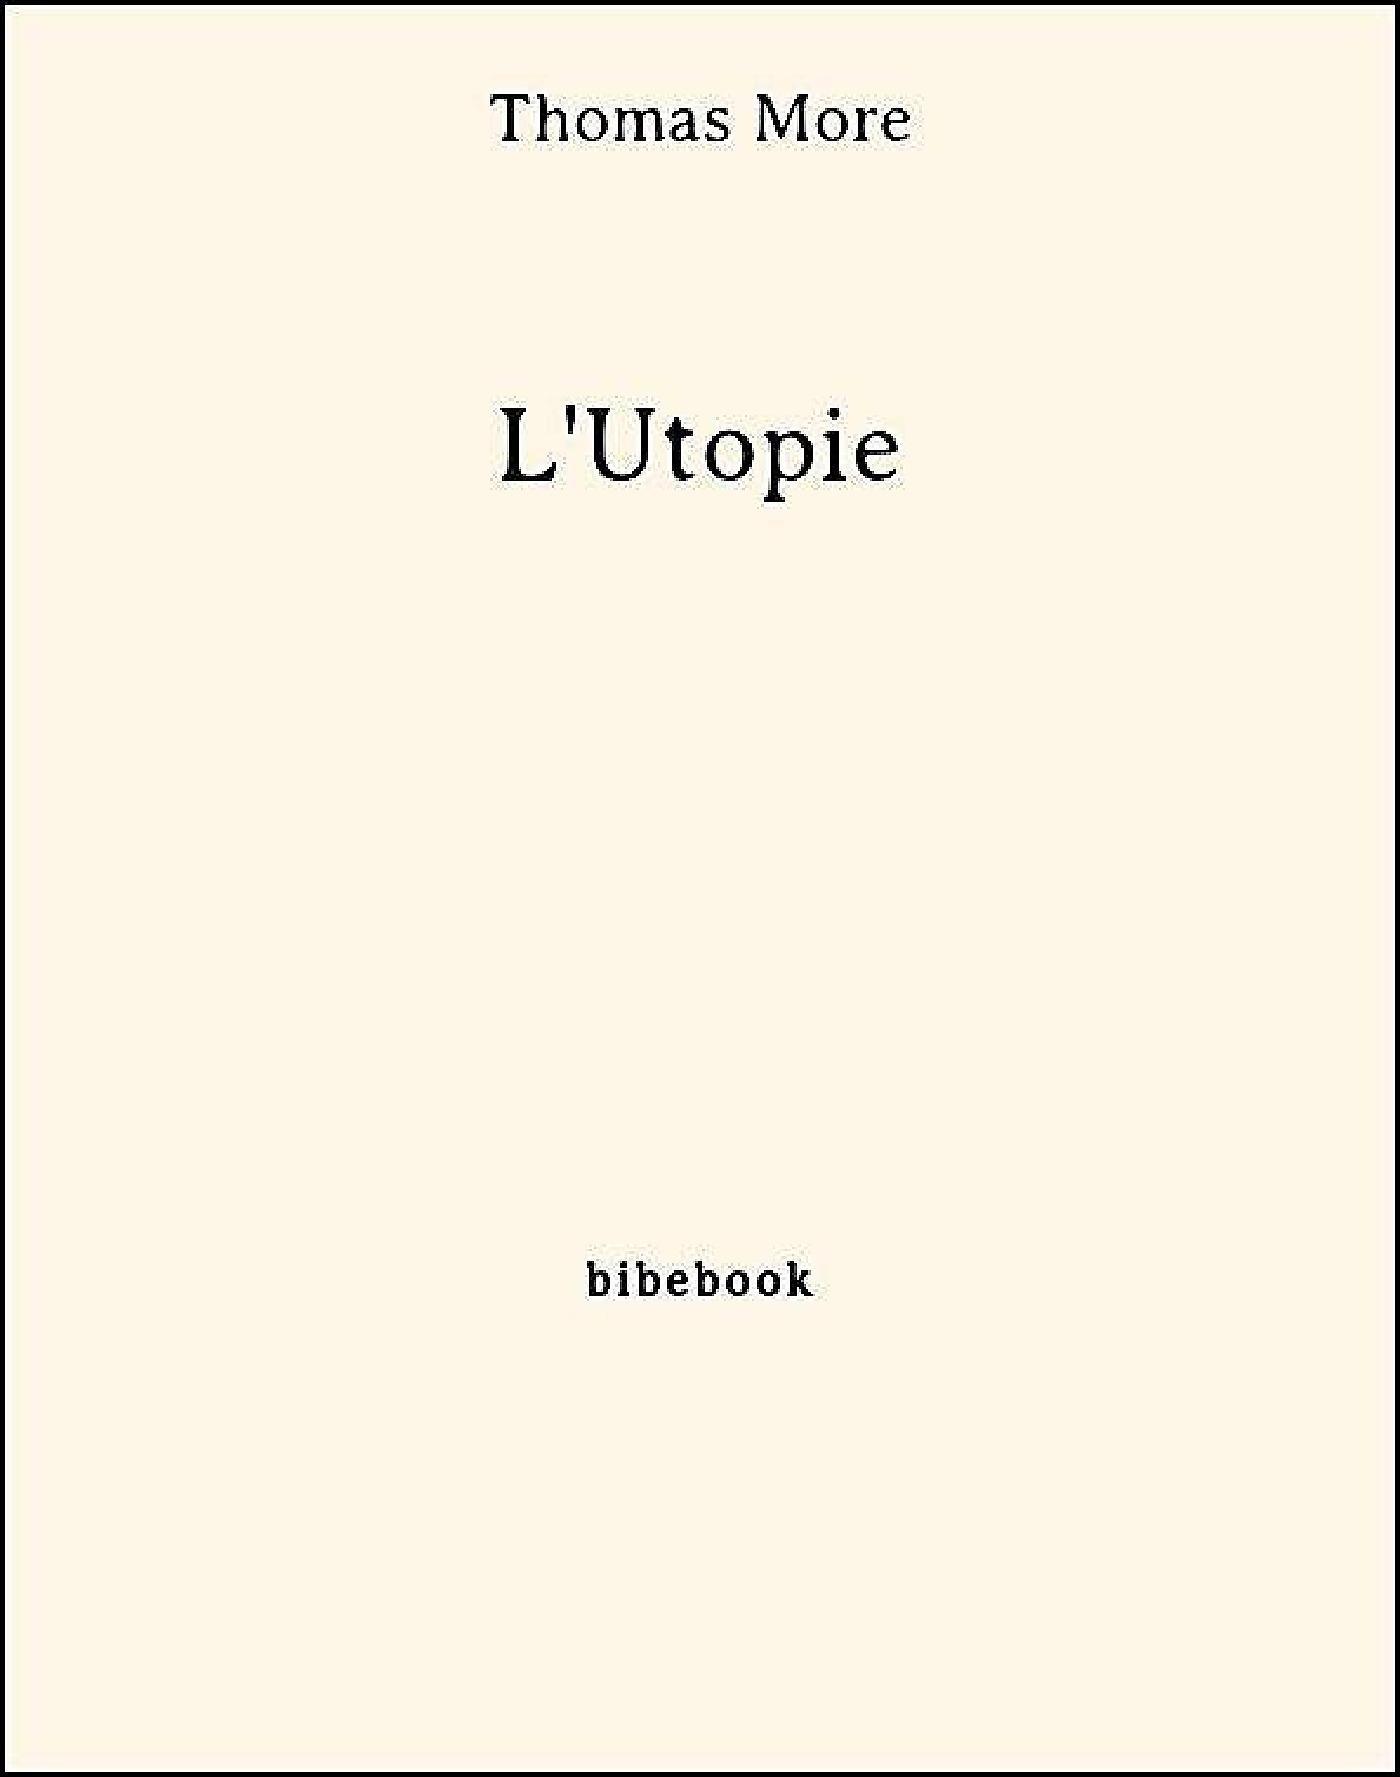 L'Utopie